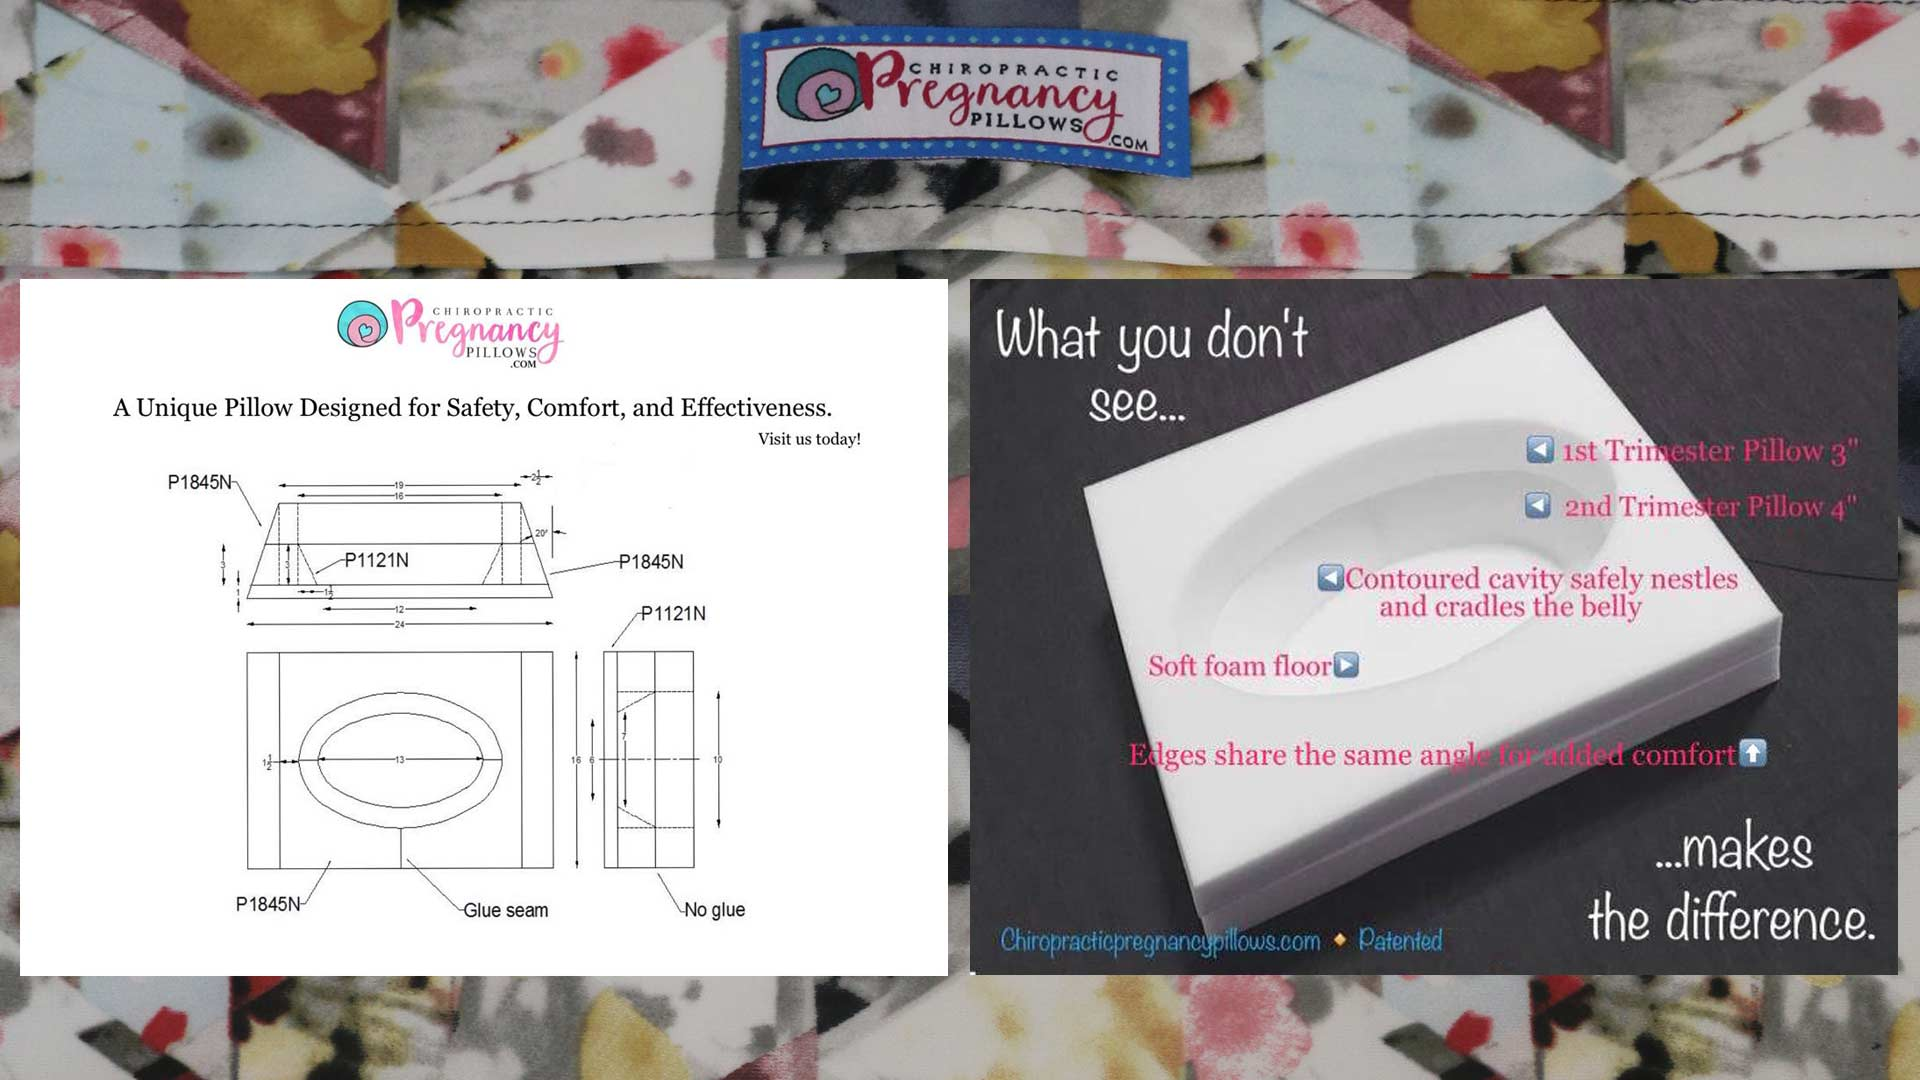 chiropractic pregnancy pillows pillow